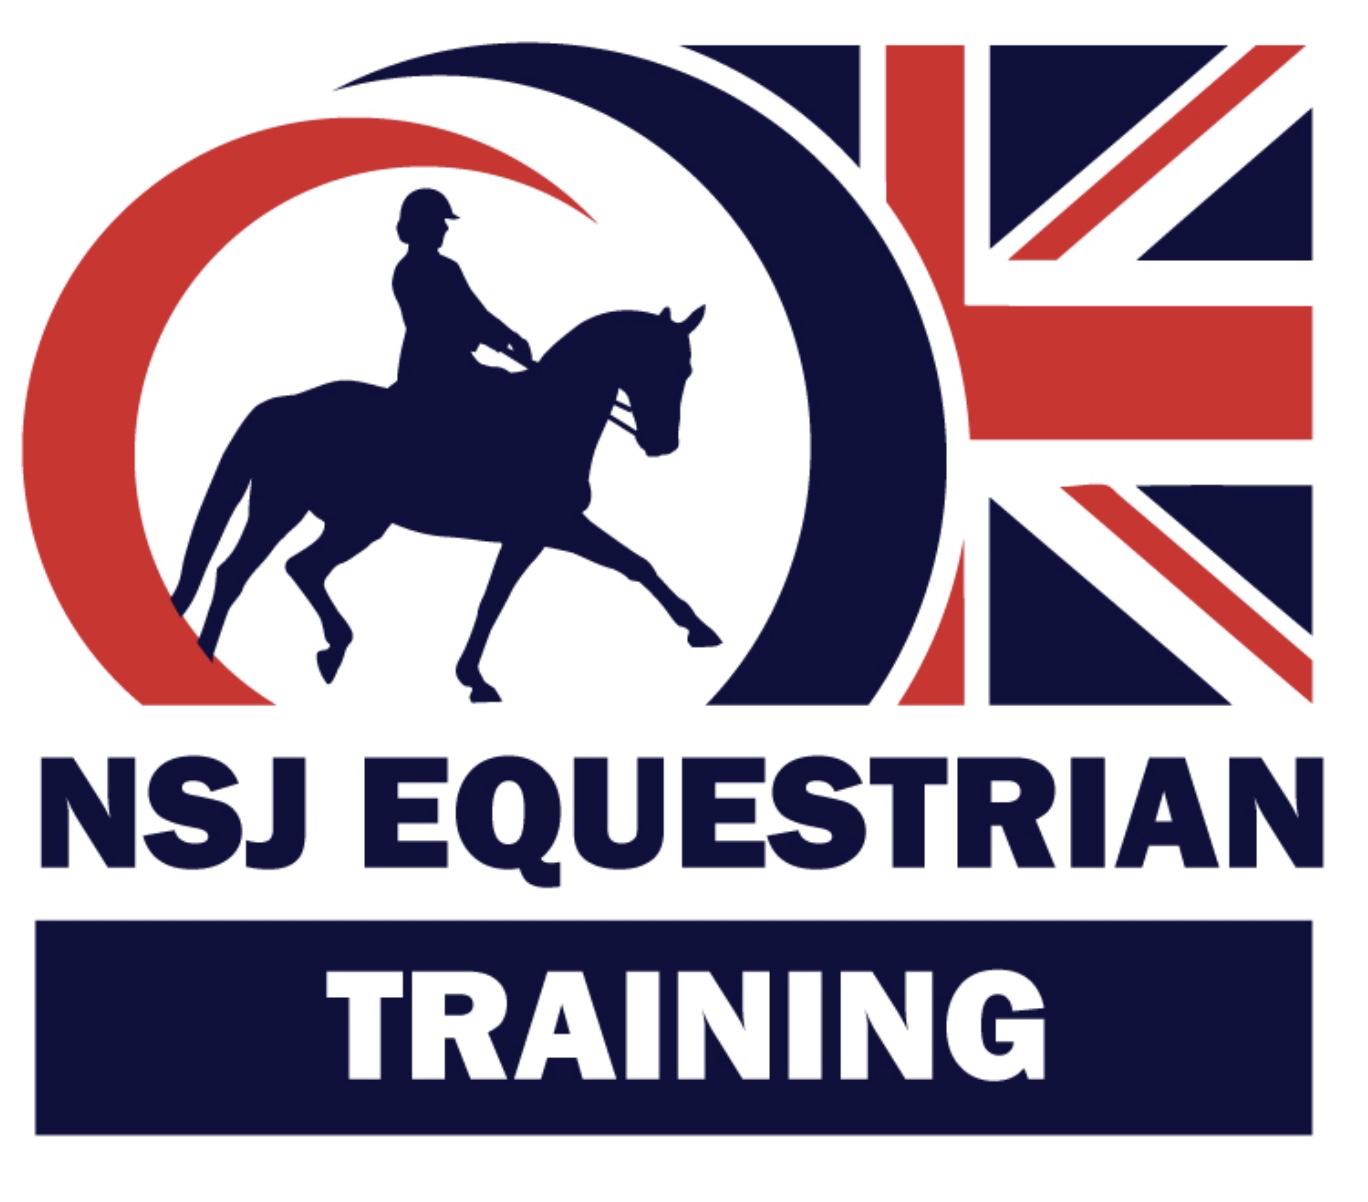 NSJ Equestrian Training